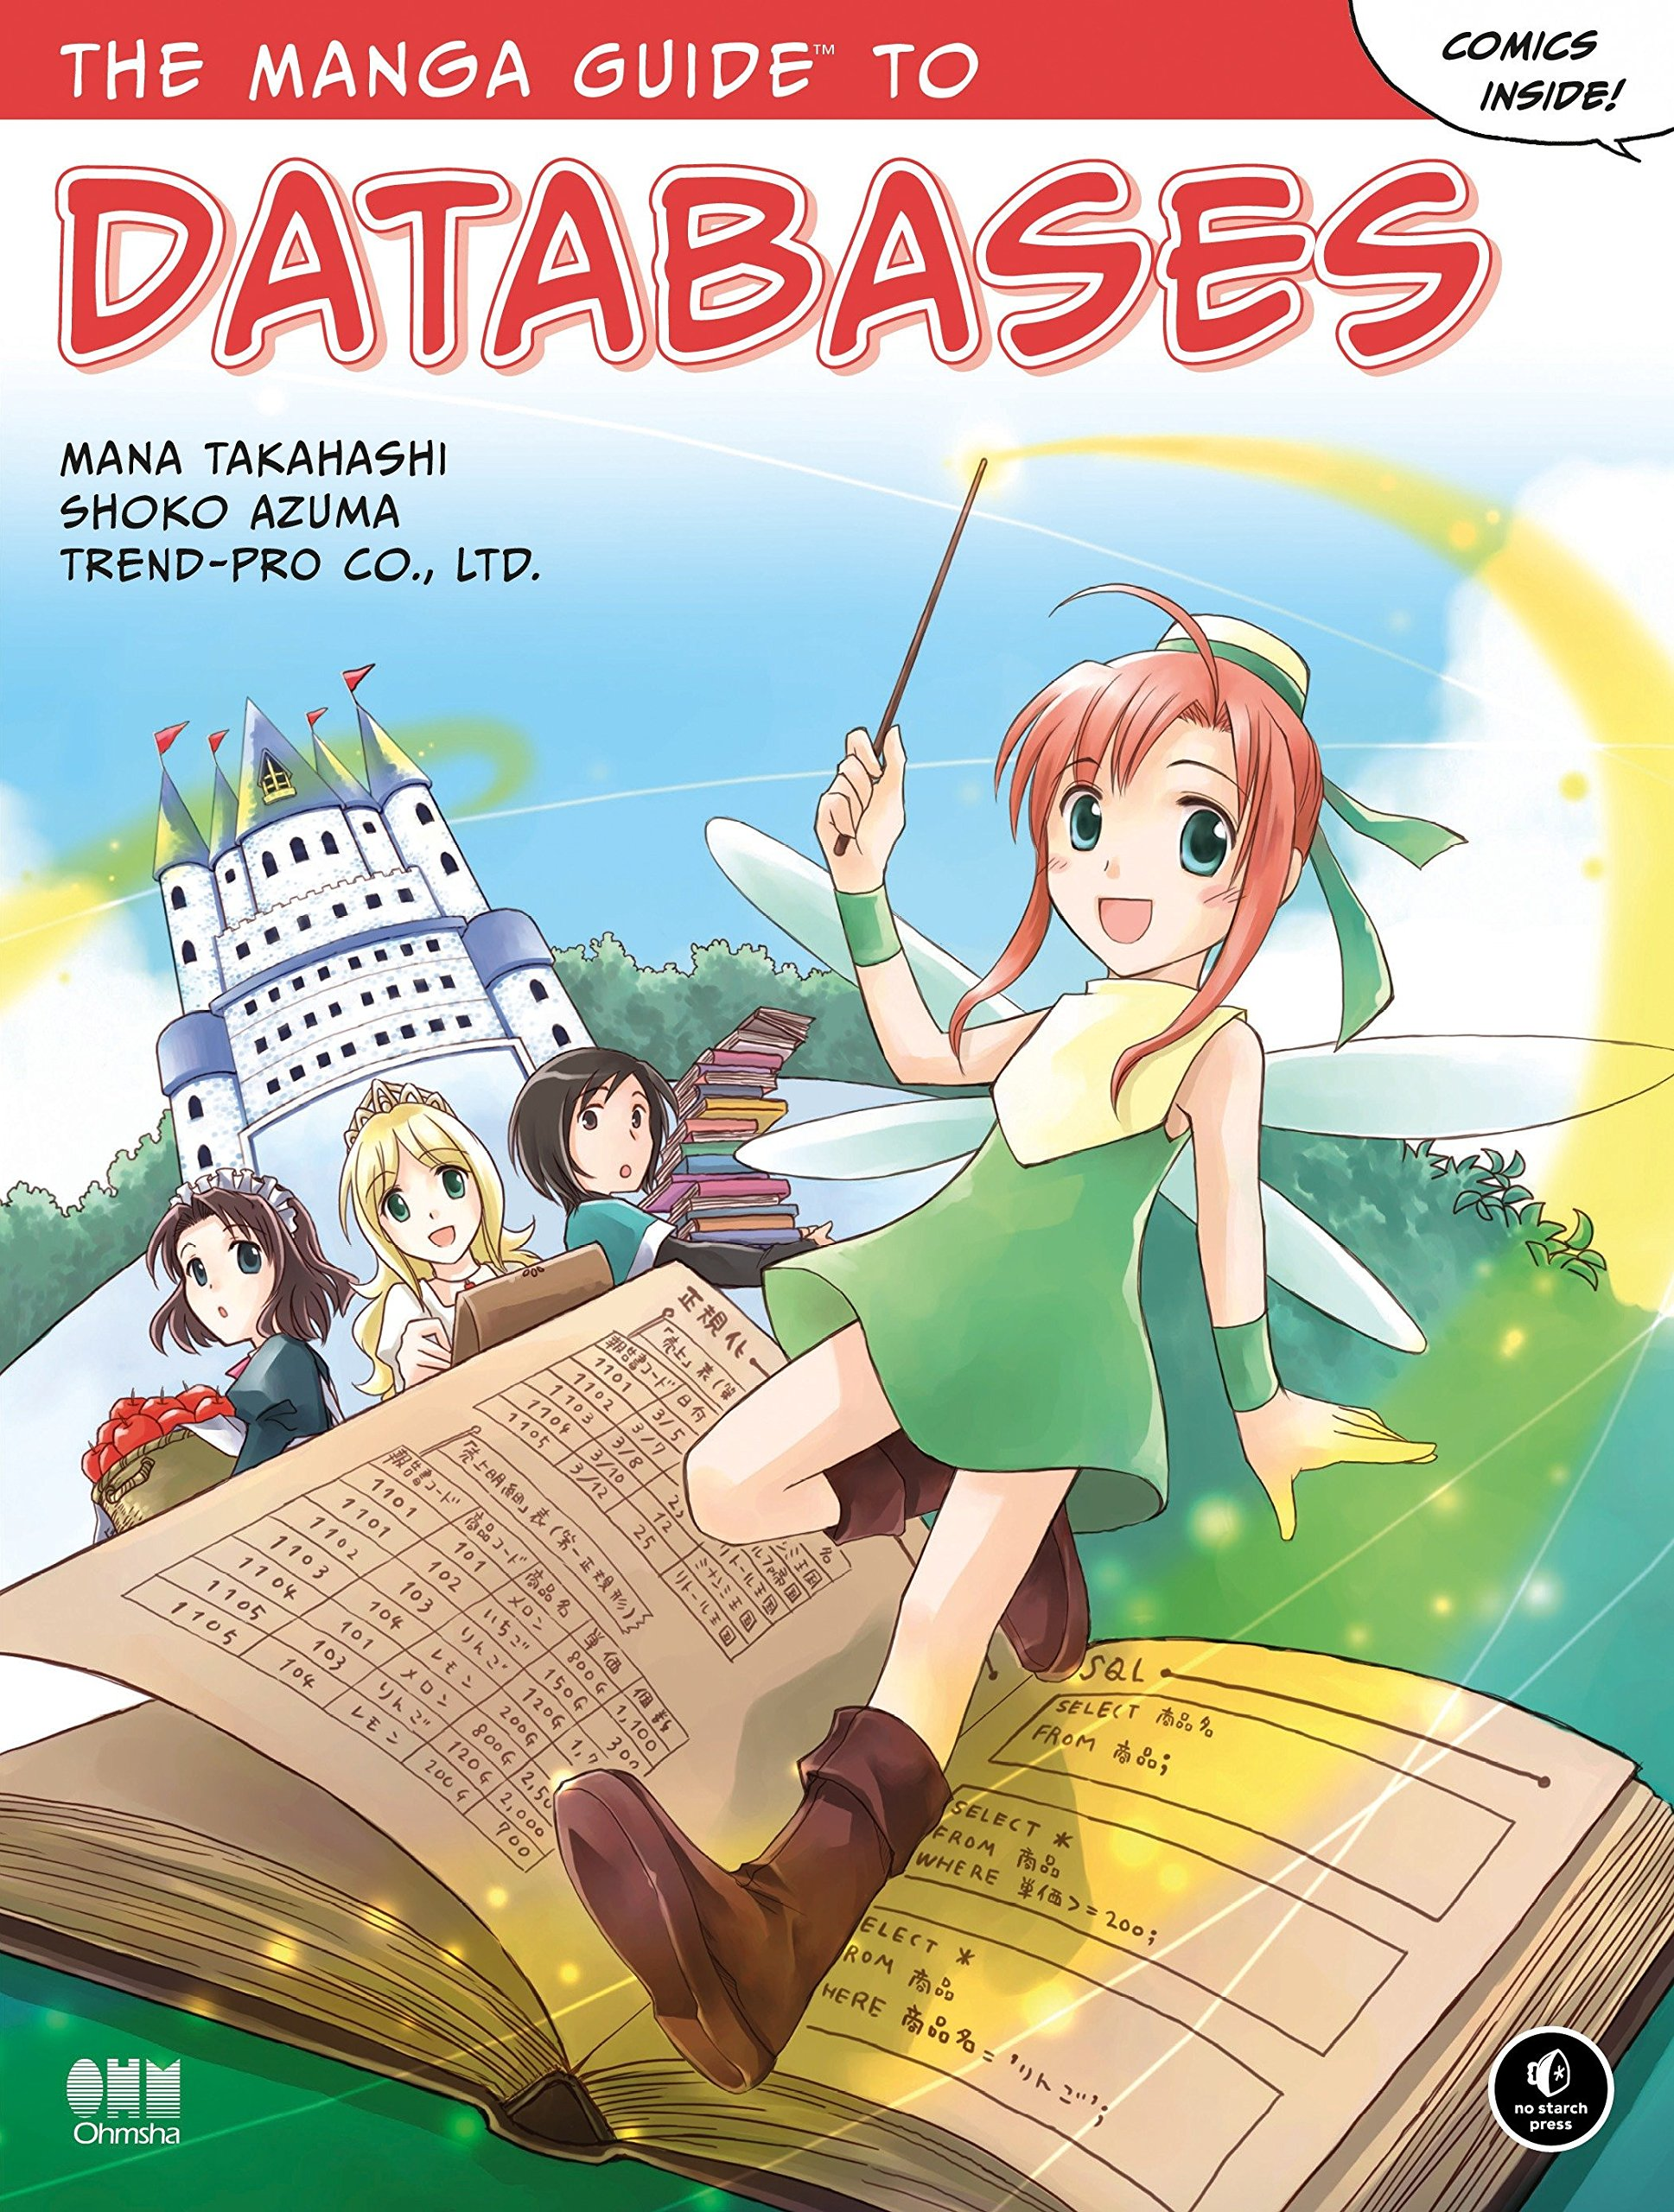 1 - Databases